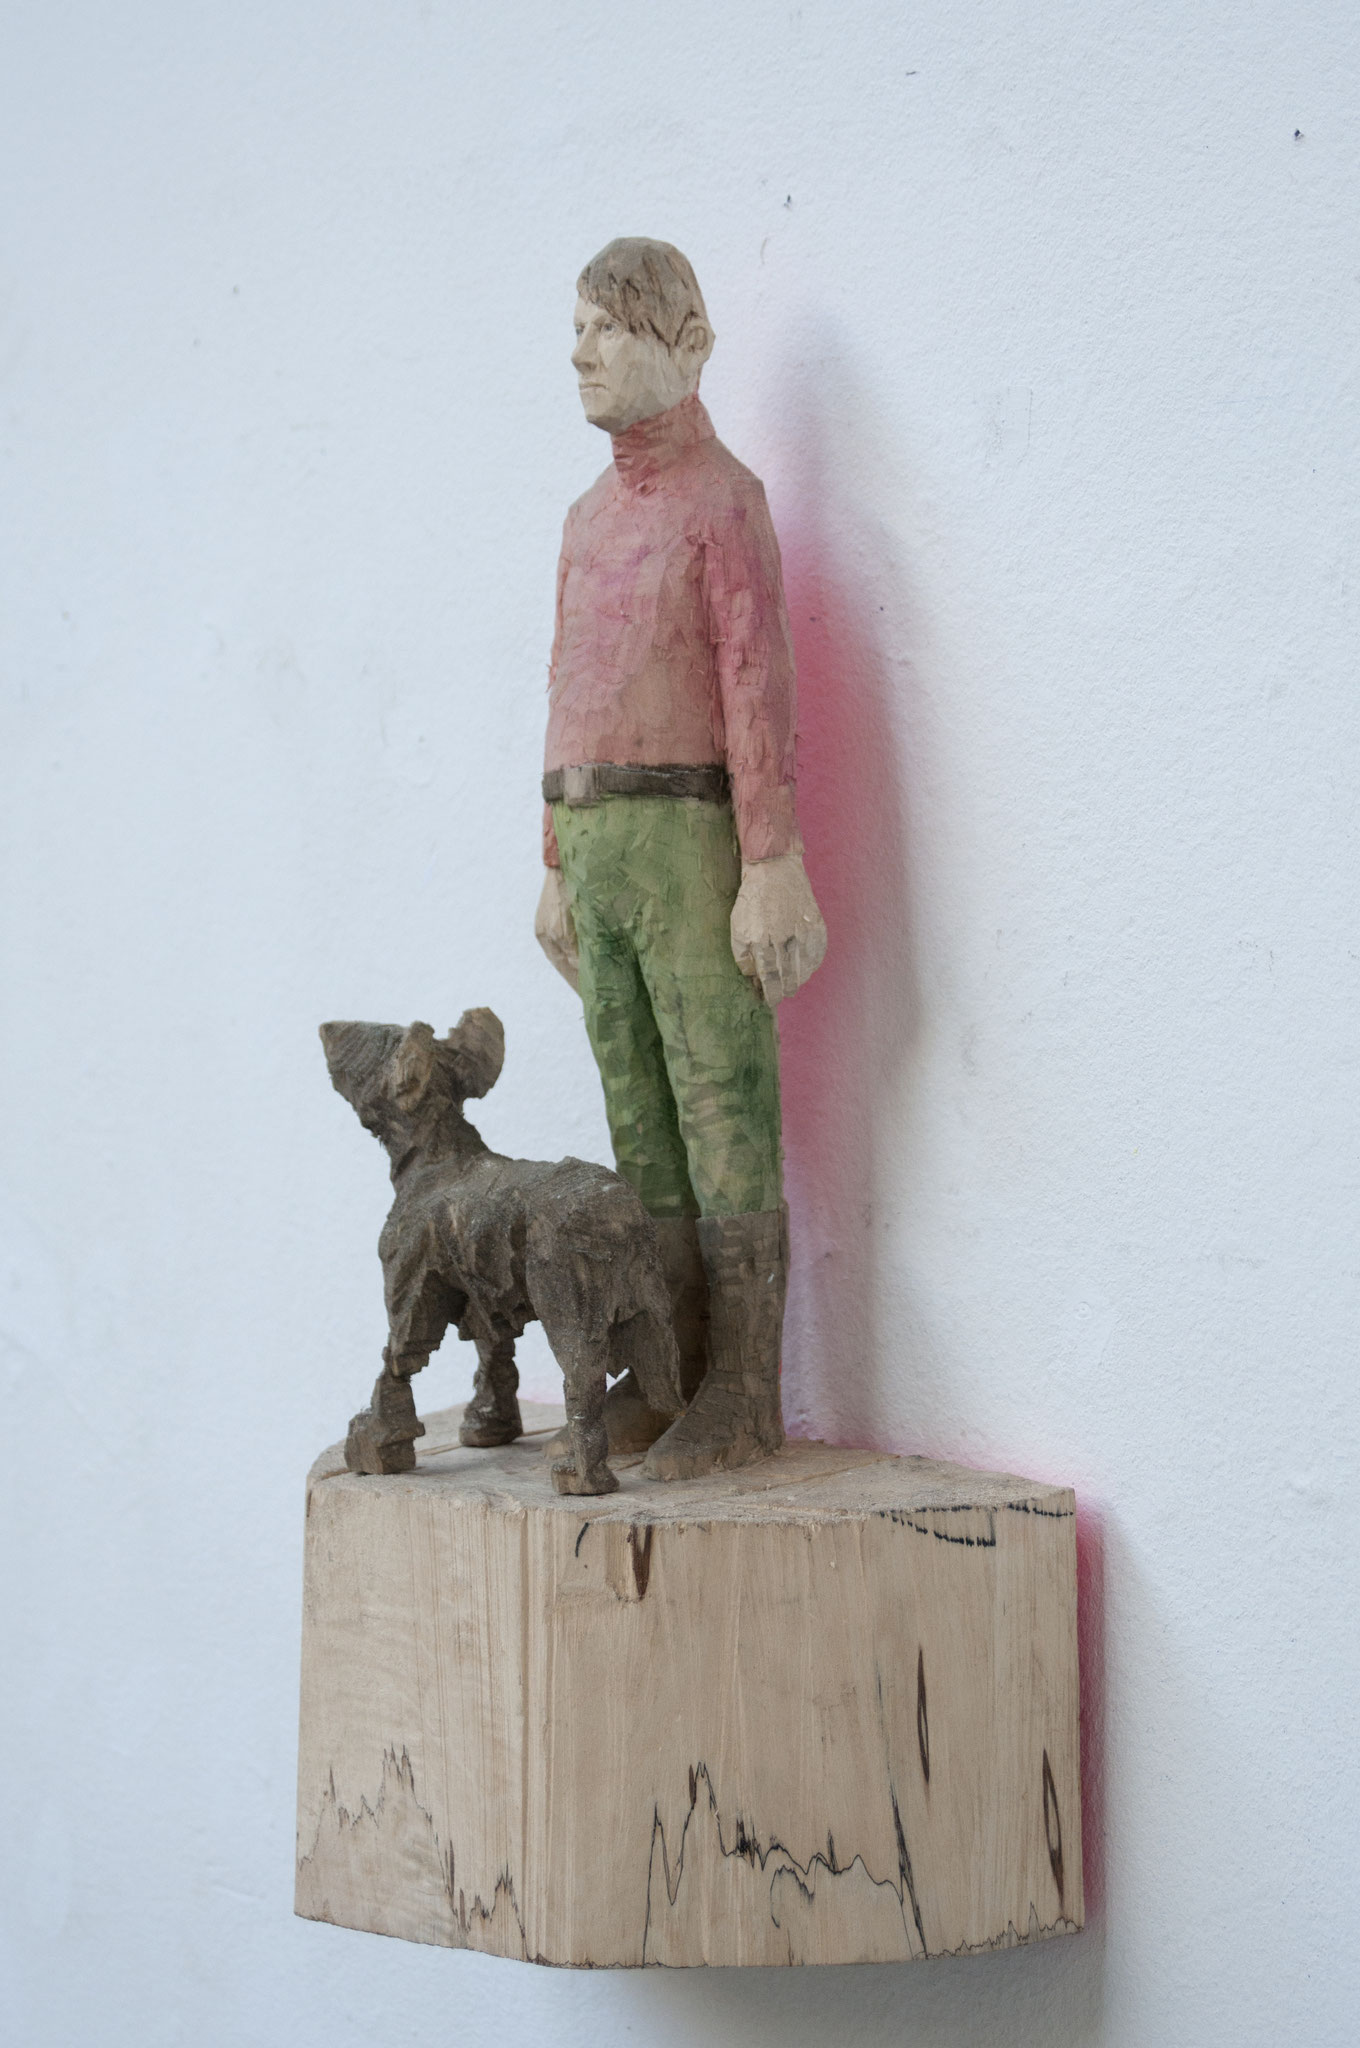 Mann mit Hund, Pappelholz bemalt, 2018, Privatbesitz